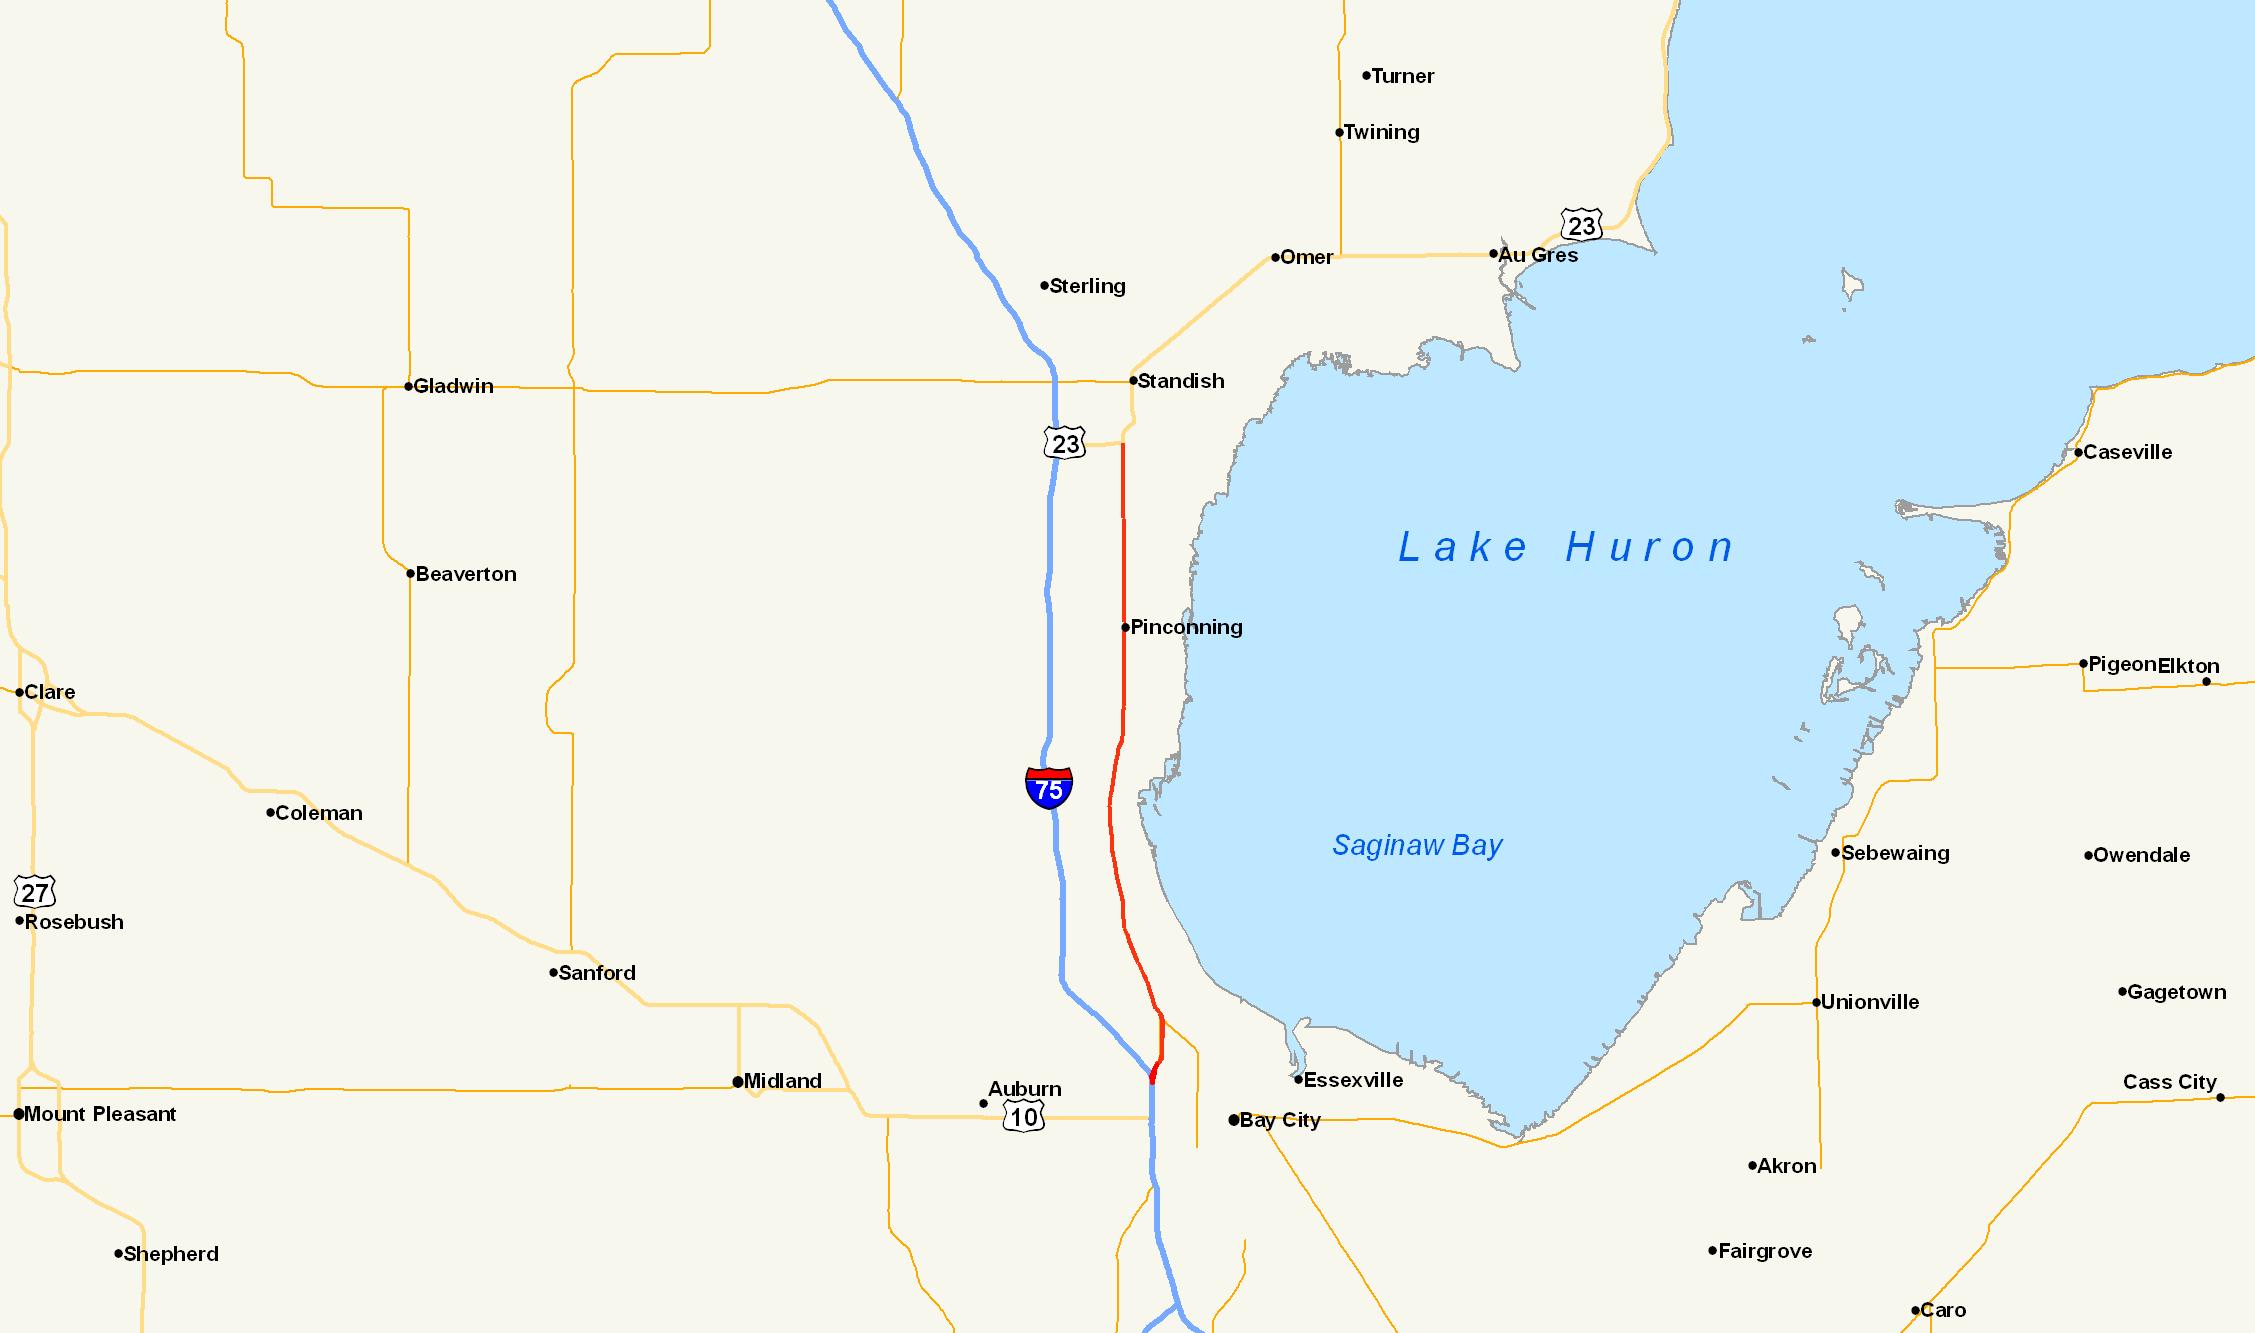 FileUS Alt Standish Michiganpng Wikimedia Commons - Map of us 23 in michigan